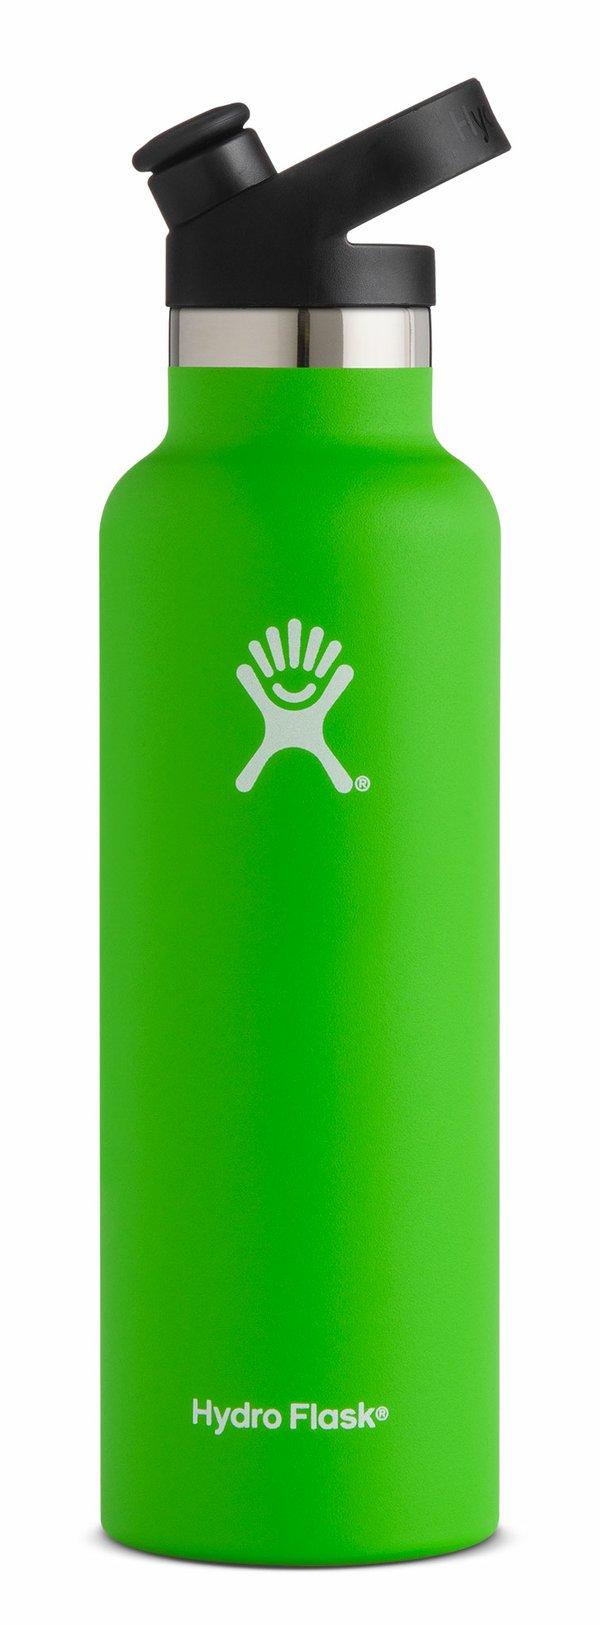 Hydro-Flask-21-oz-Standard-Mouth-with-Sport-Cap-Kiwi.jpg